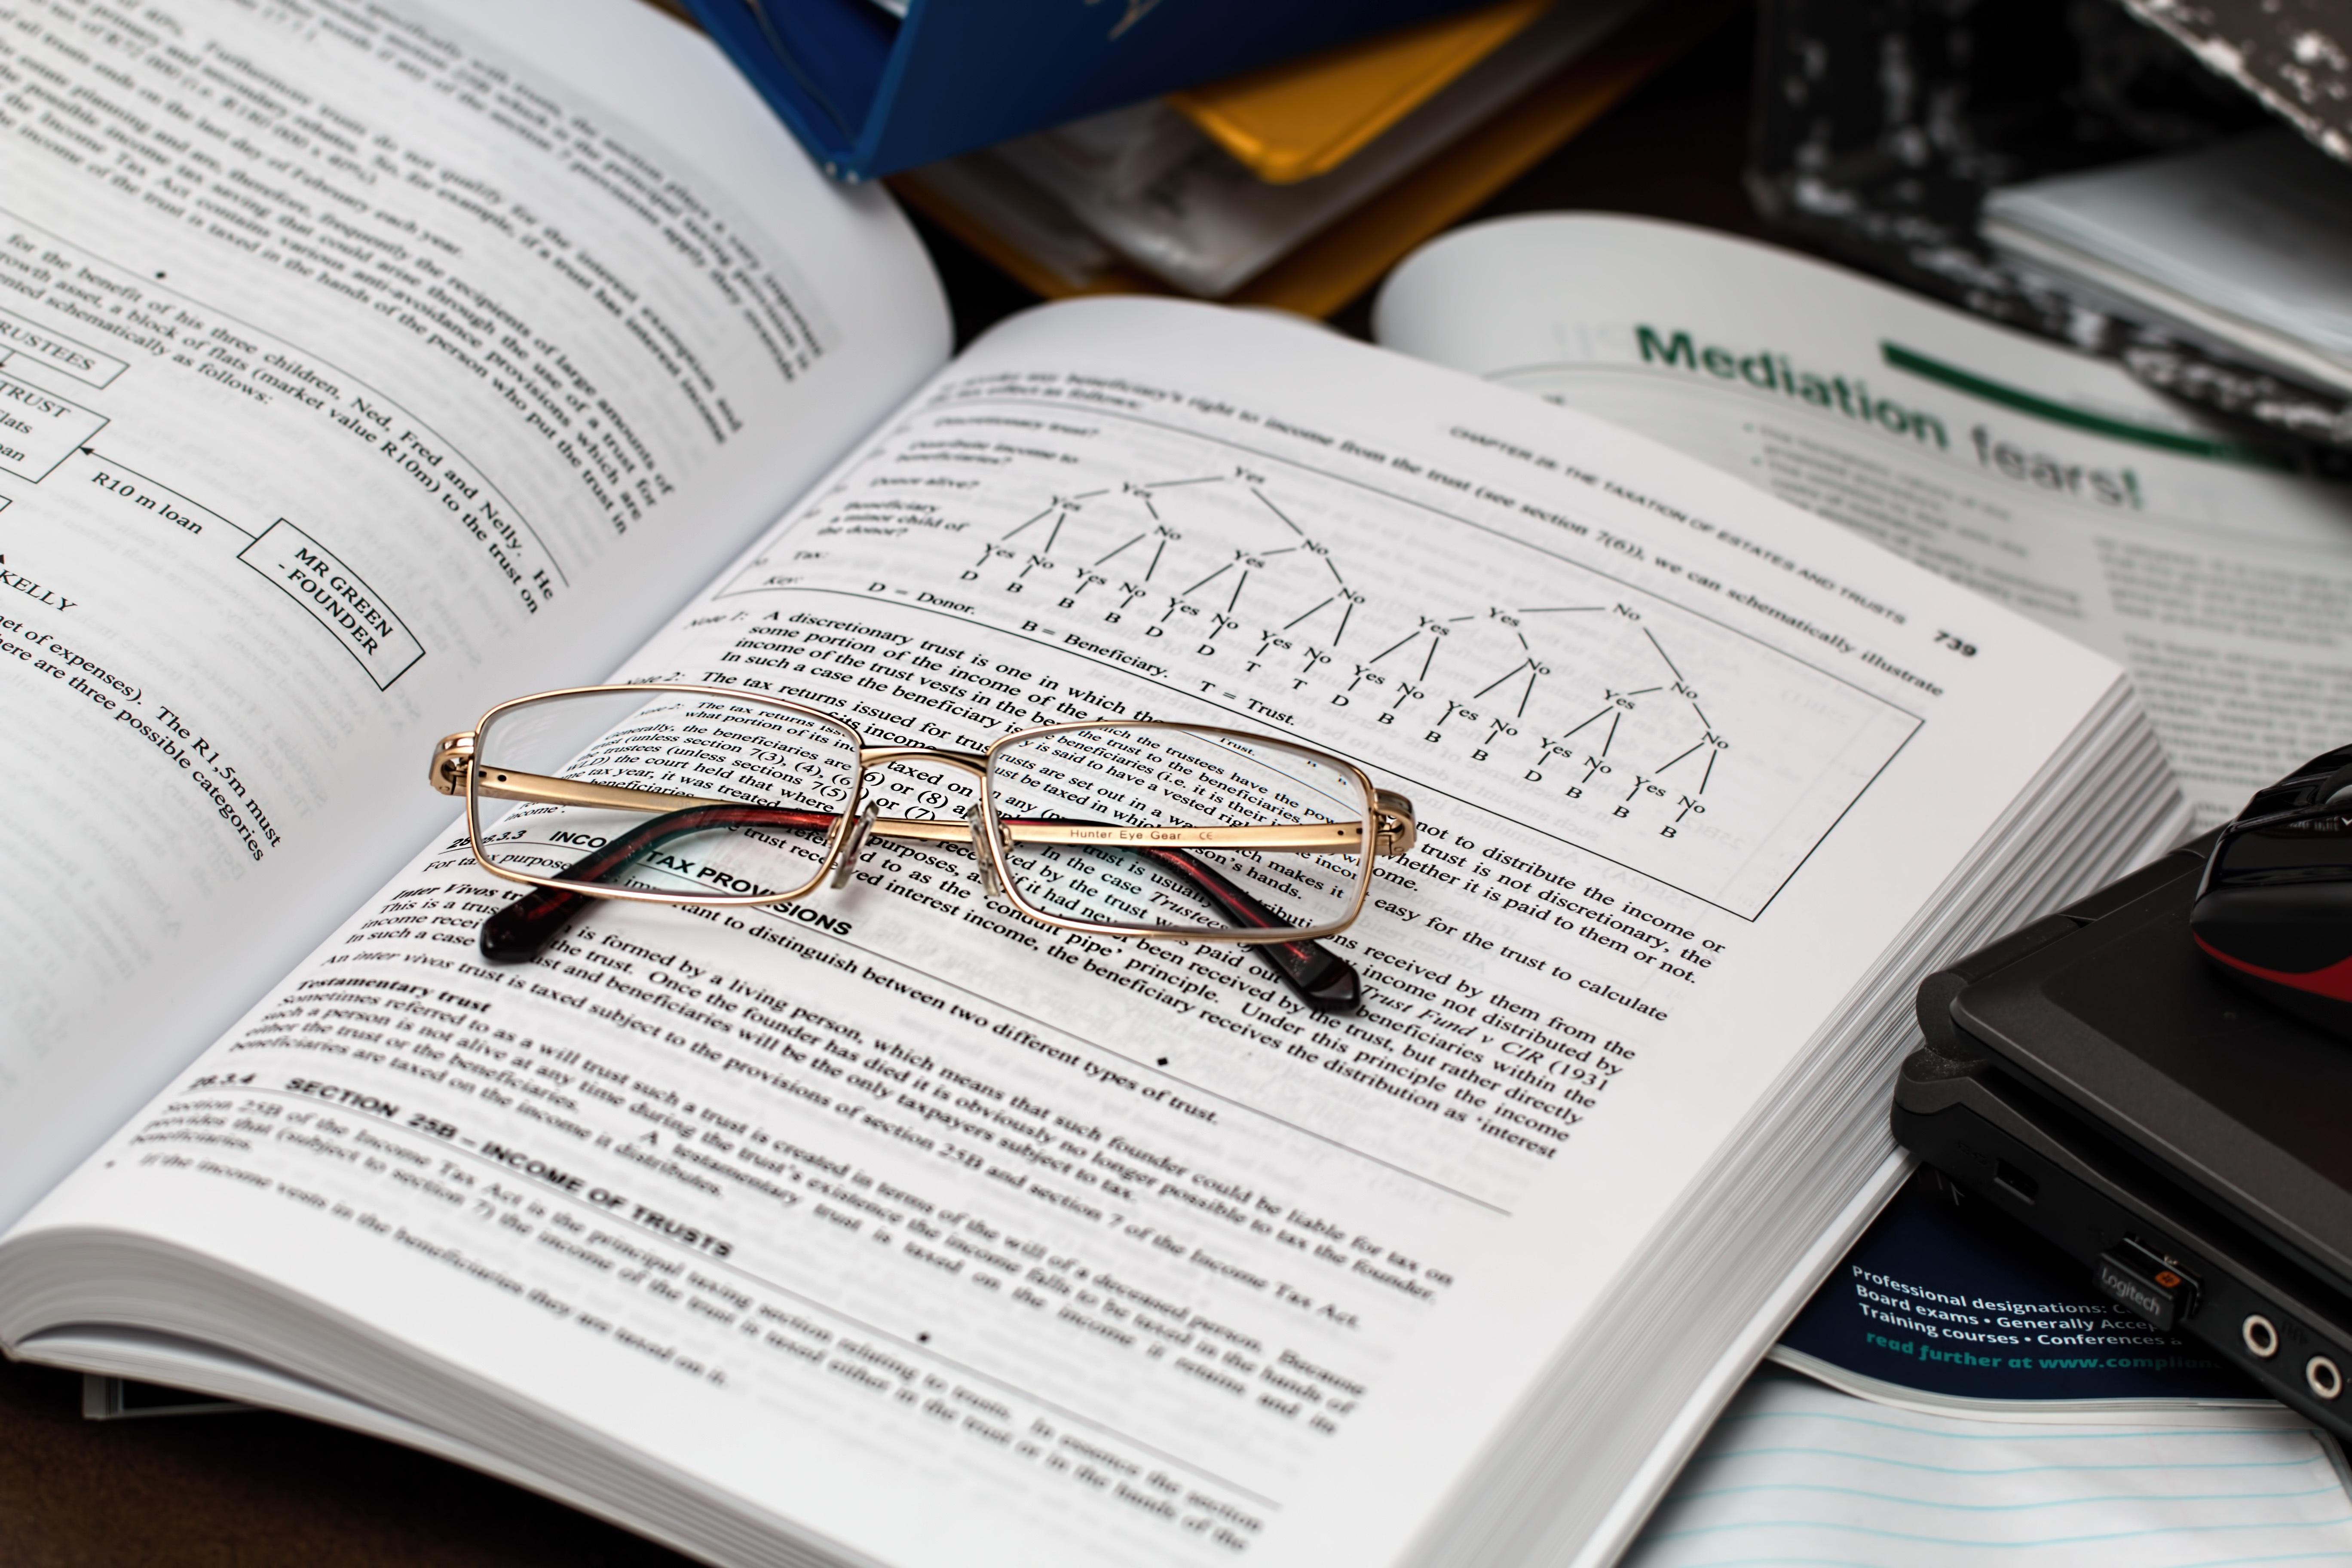 Free stock photo of books, writing, school, business